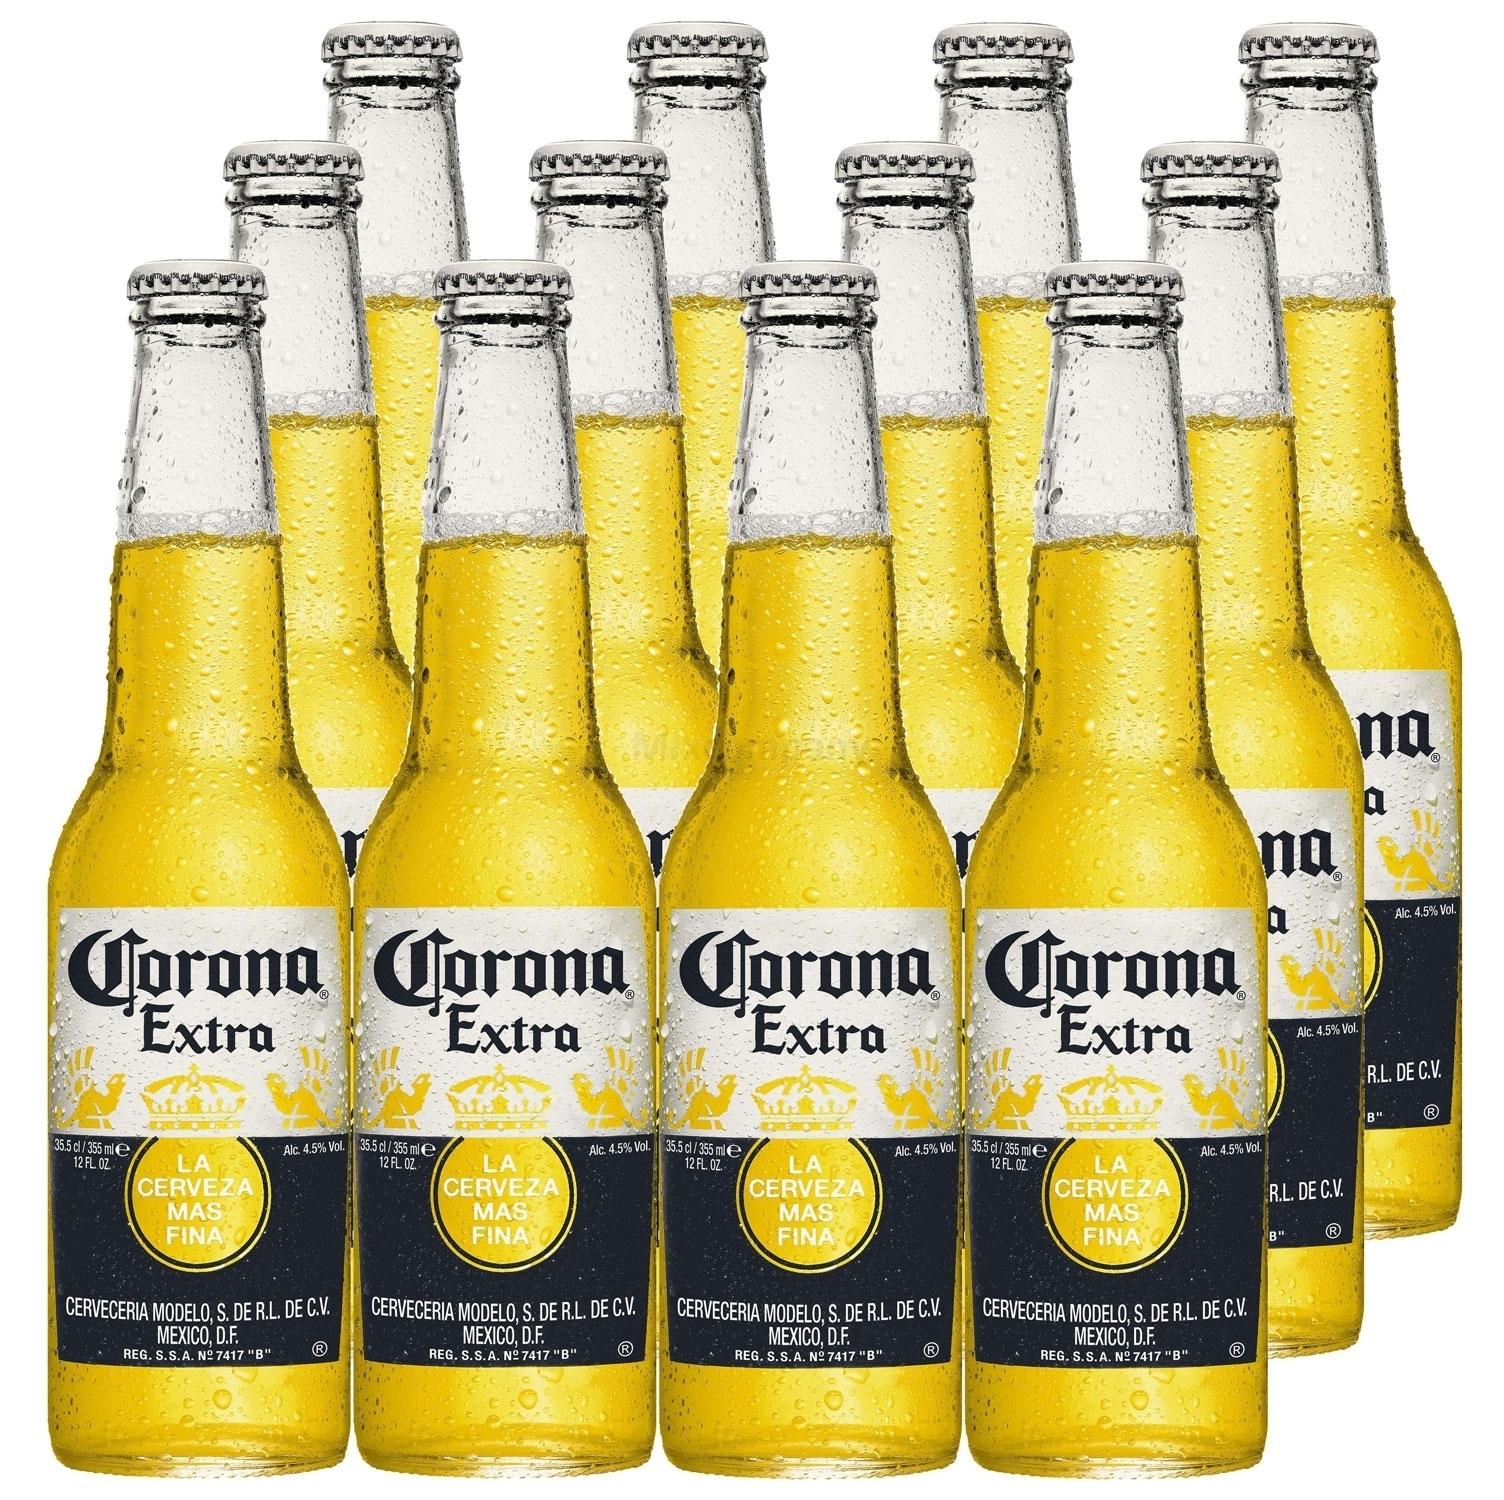 Corona Extra Mexikanisches Bier inkl. Pfand - 12x 355ml (4,5% Vol) -[Enthält Sulfite] - Inkl. Pfand MEHRWEG